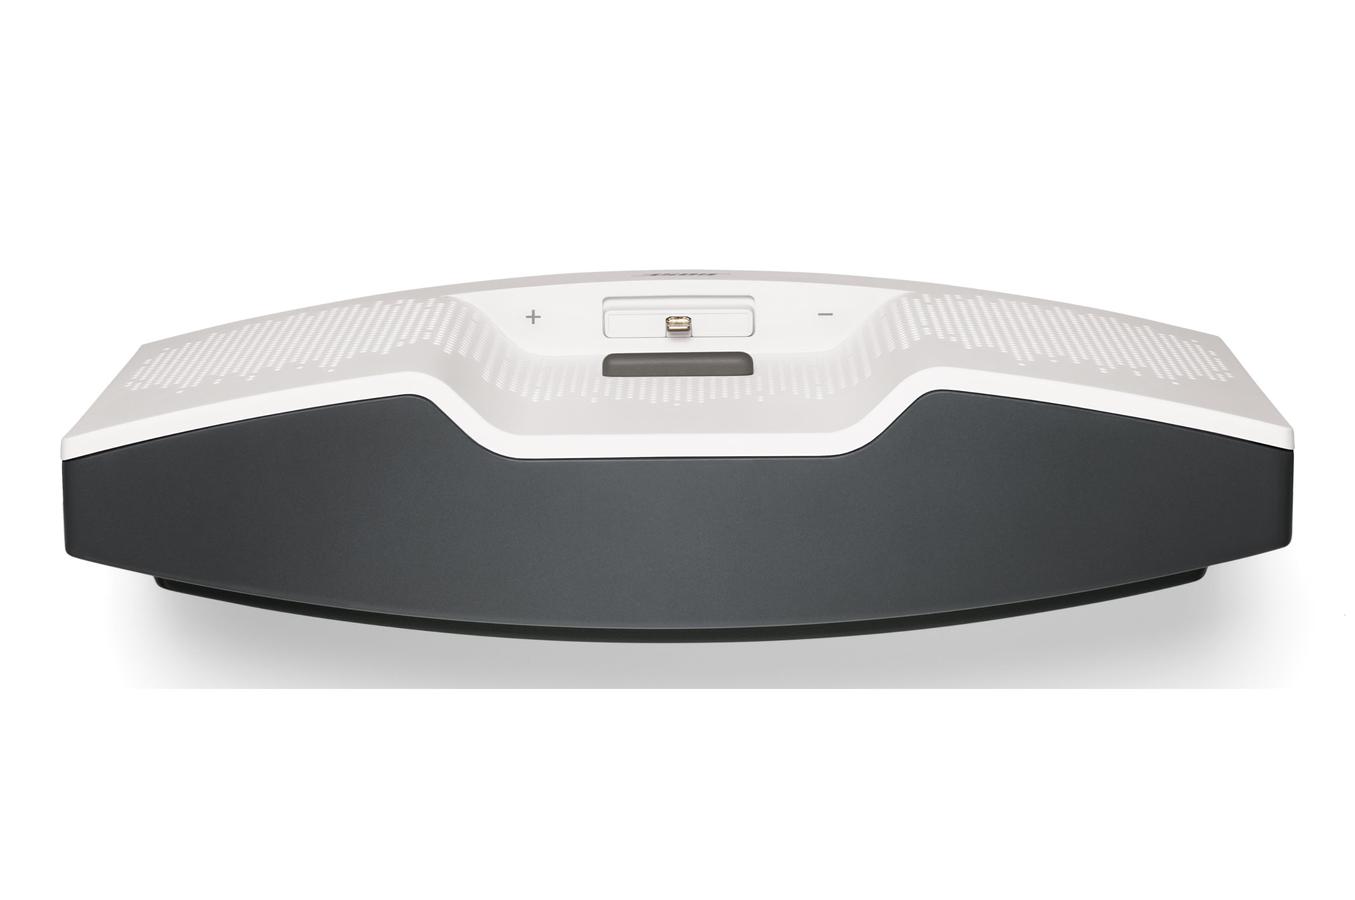 station d 39 accueil bose sounddock xt blanc gris 4047923. Black Bedroom Furniture Sets. Home Design Ideas